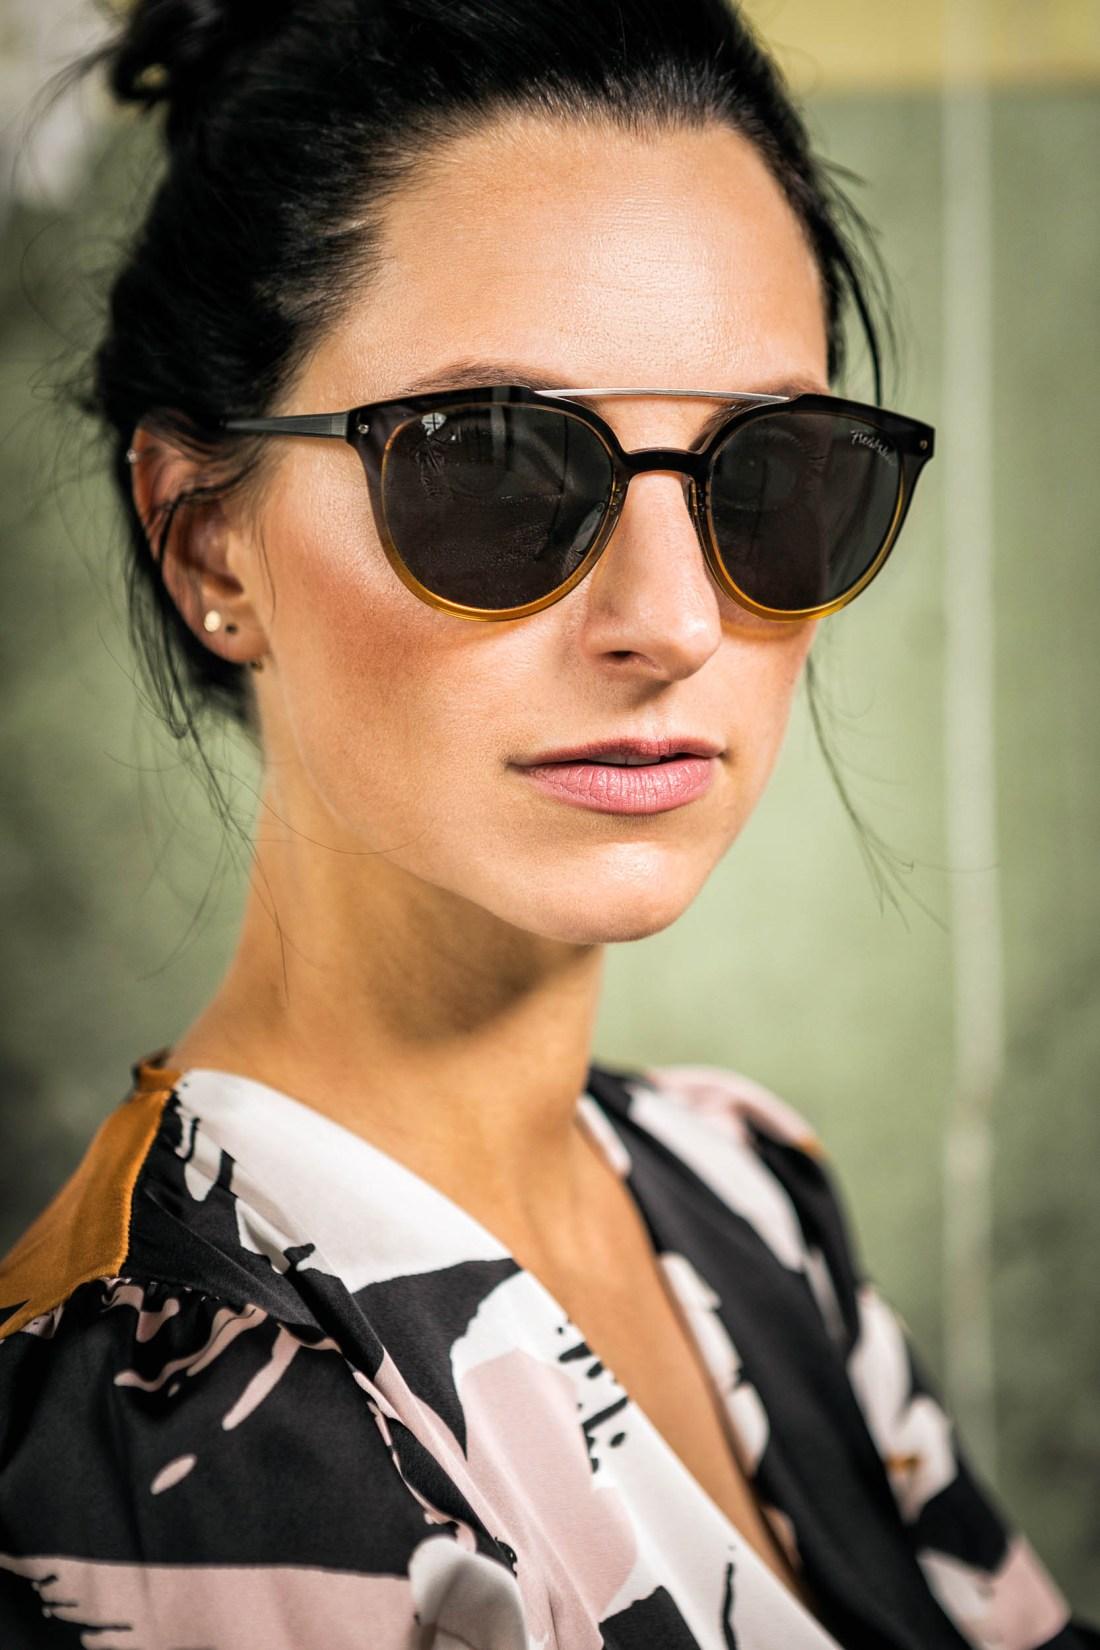 Freakshow, sunglasses, eyewear, faceprint